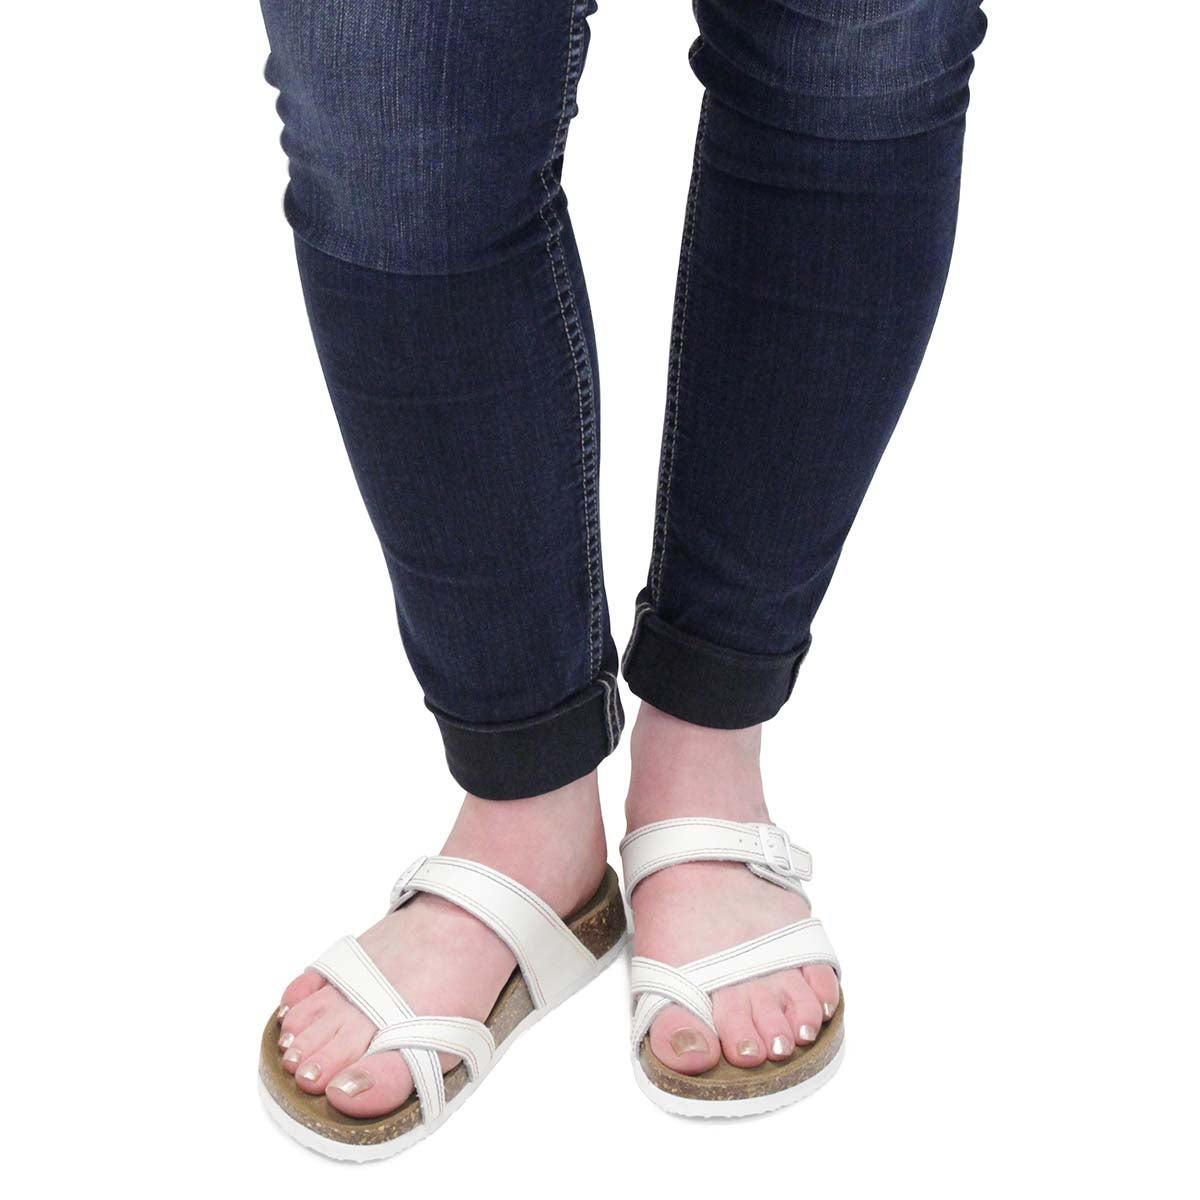 Lds Alicia 5 Pri wht mem foam sandal